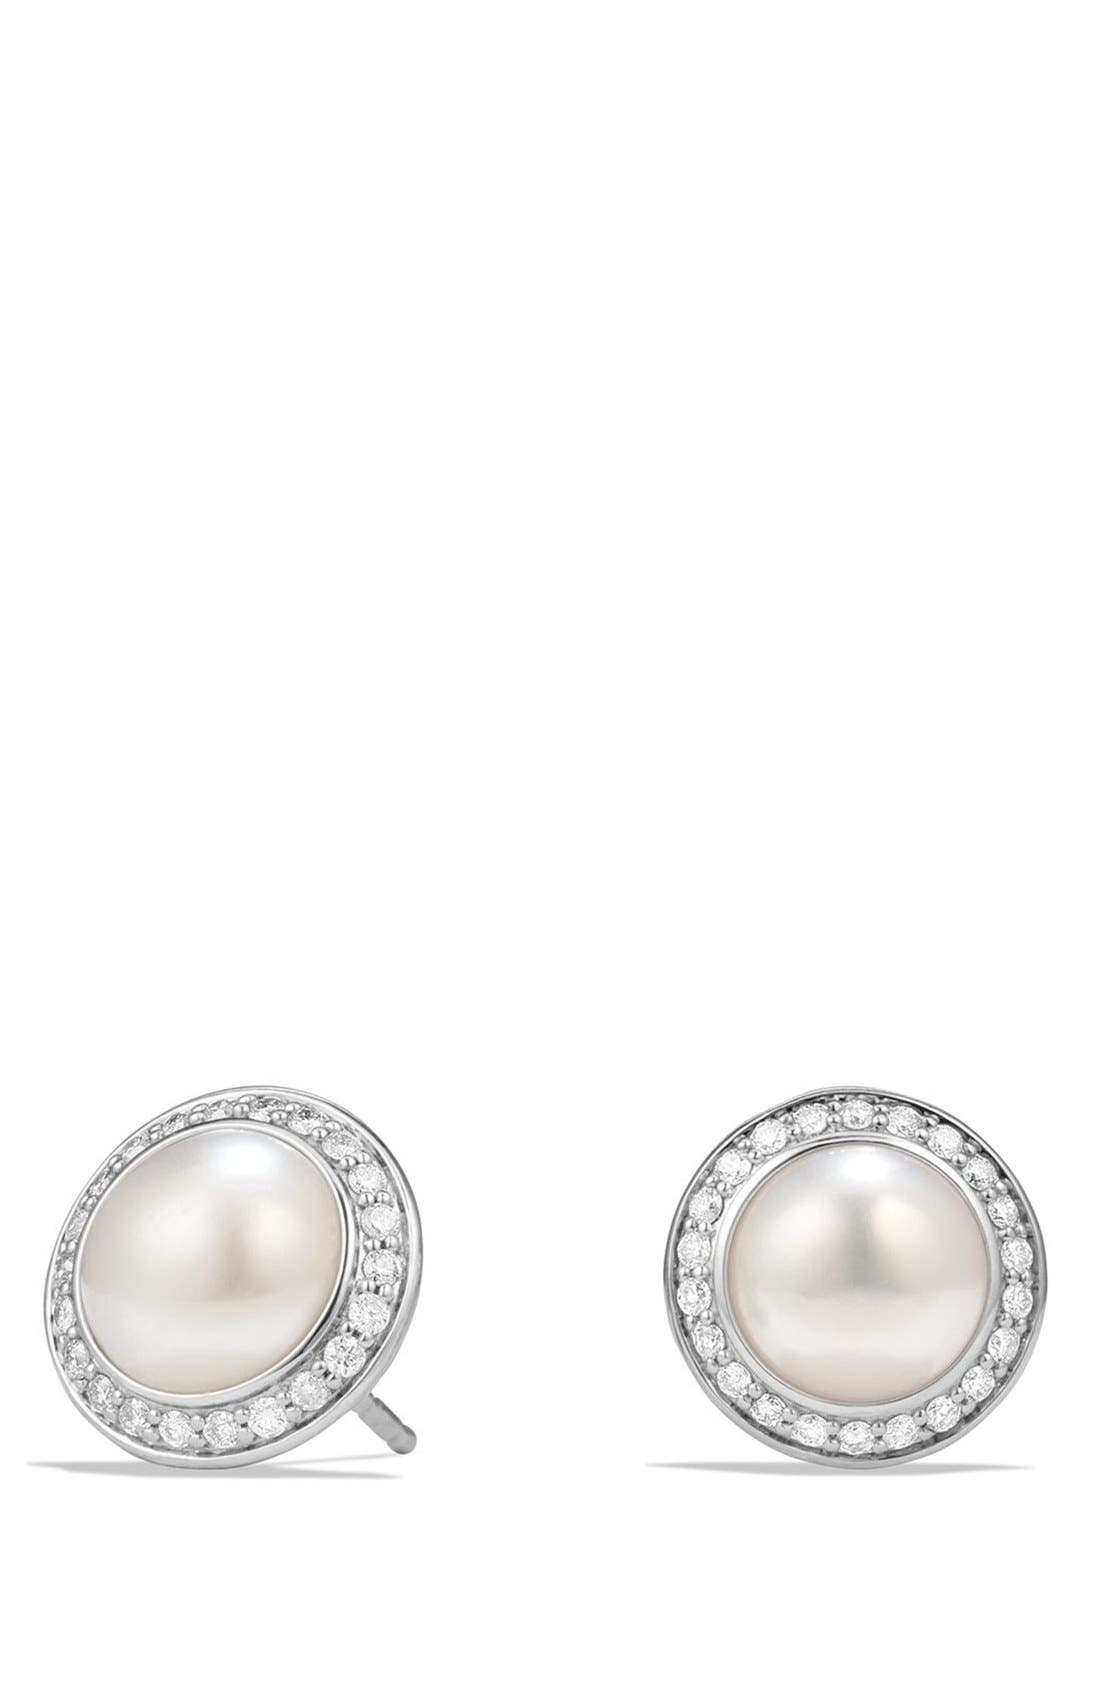 Main Image - David Yurman 'Cerise' Petite Earrings with Pearls and Diamonds